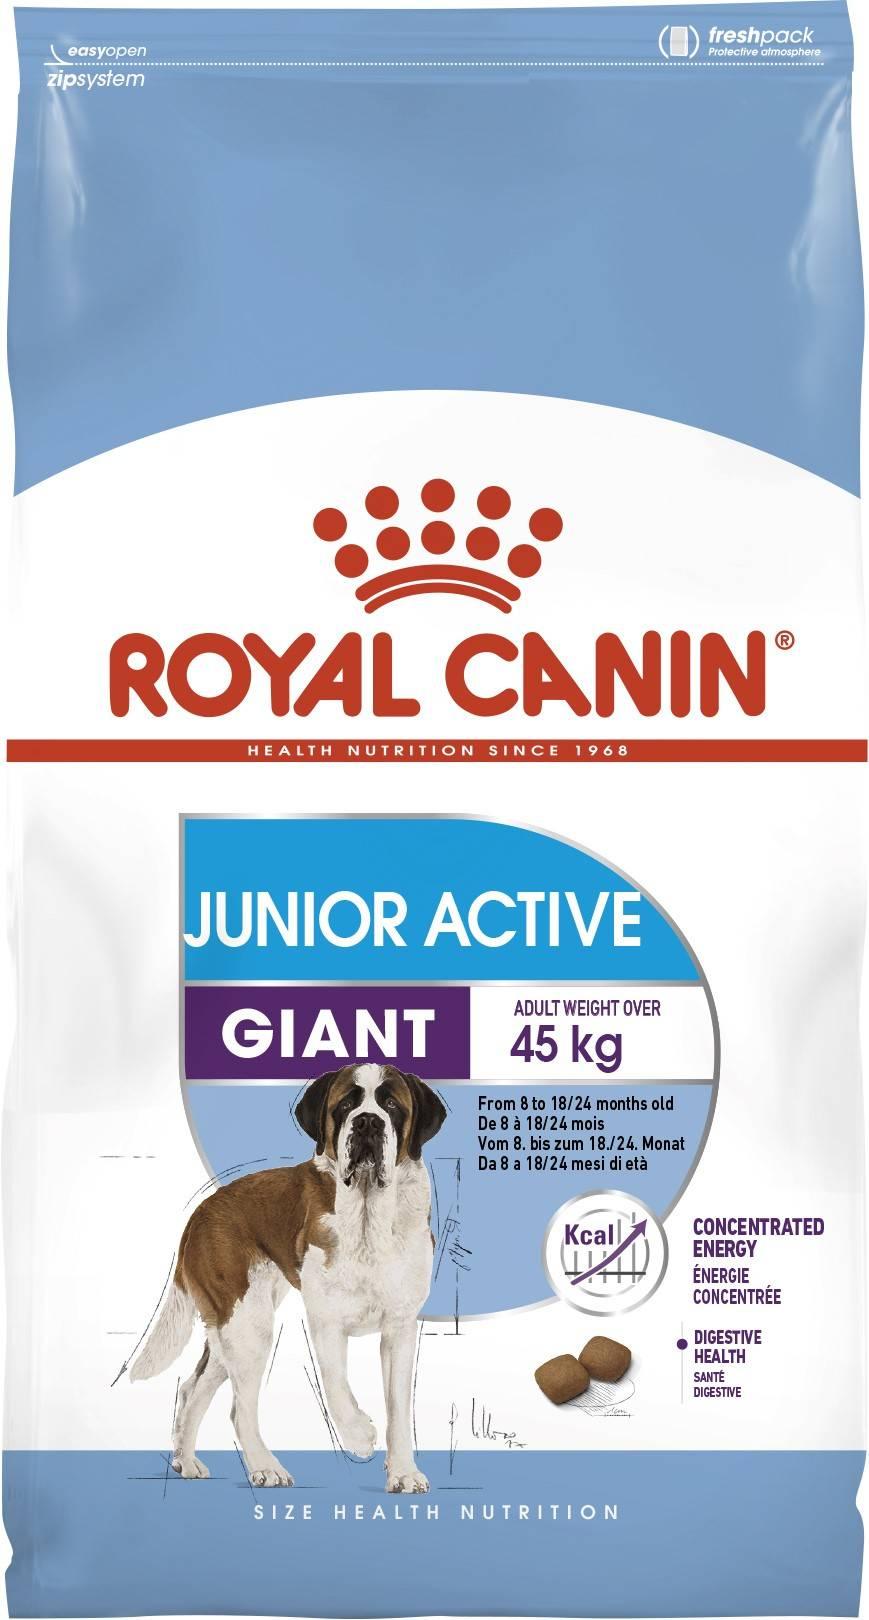 ROYAL CANIN GIANT JUNIOR ACTIVE – сухий корм для цуценят гігантських порід з високими енергетичними потребами